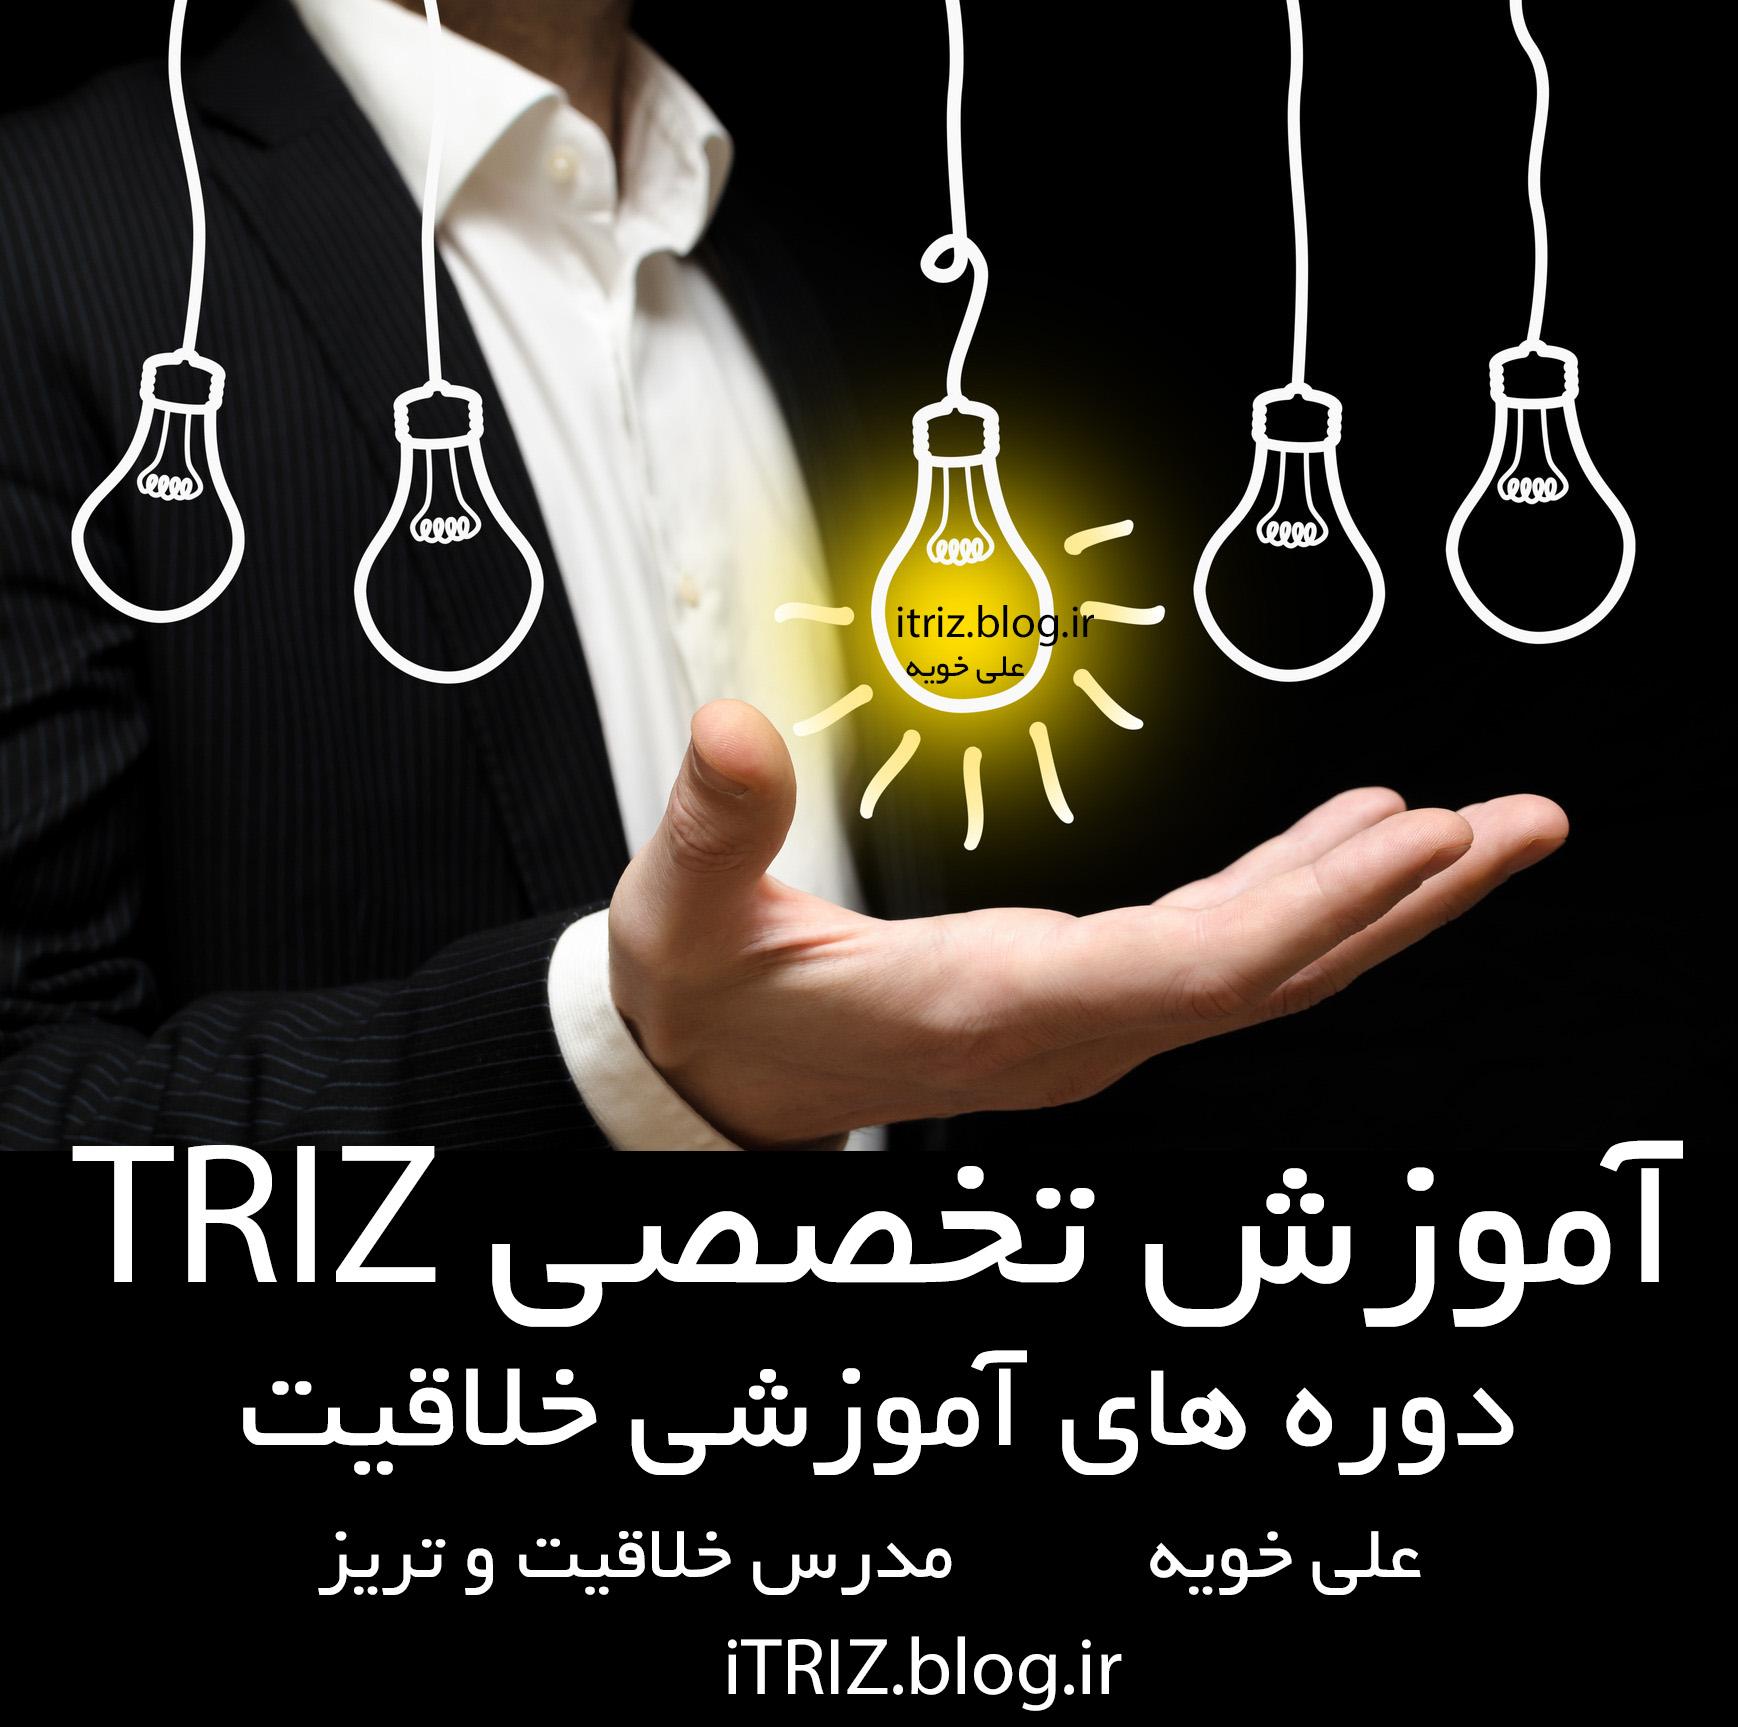 triz آموزش تخصصصی تریز و خلاقیت ، کلاس های خلاقیت